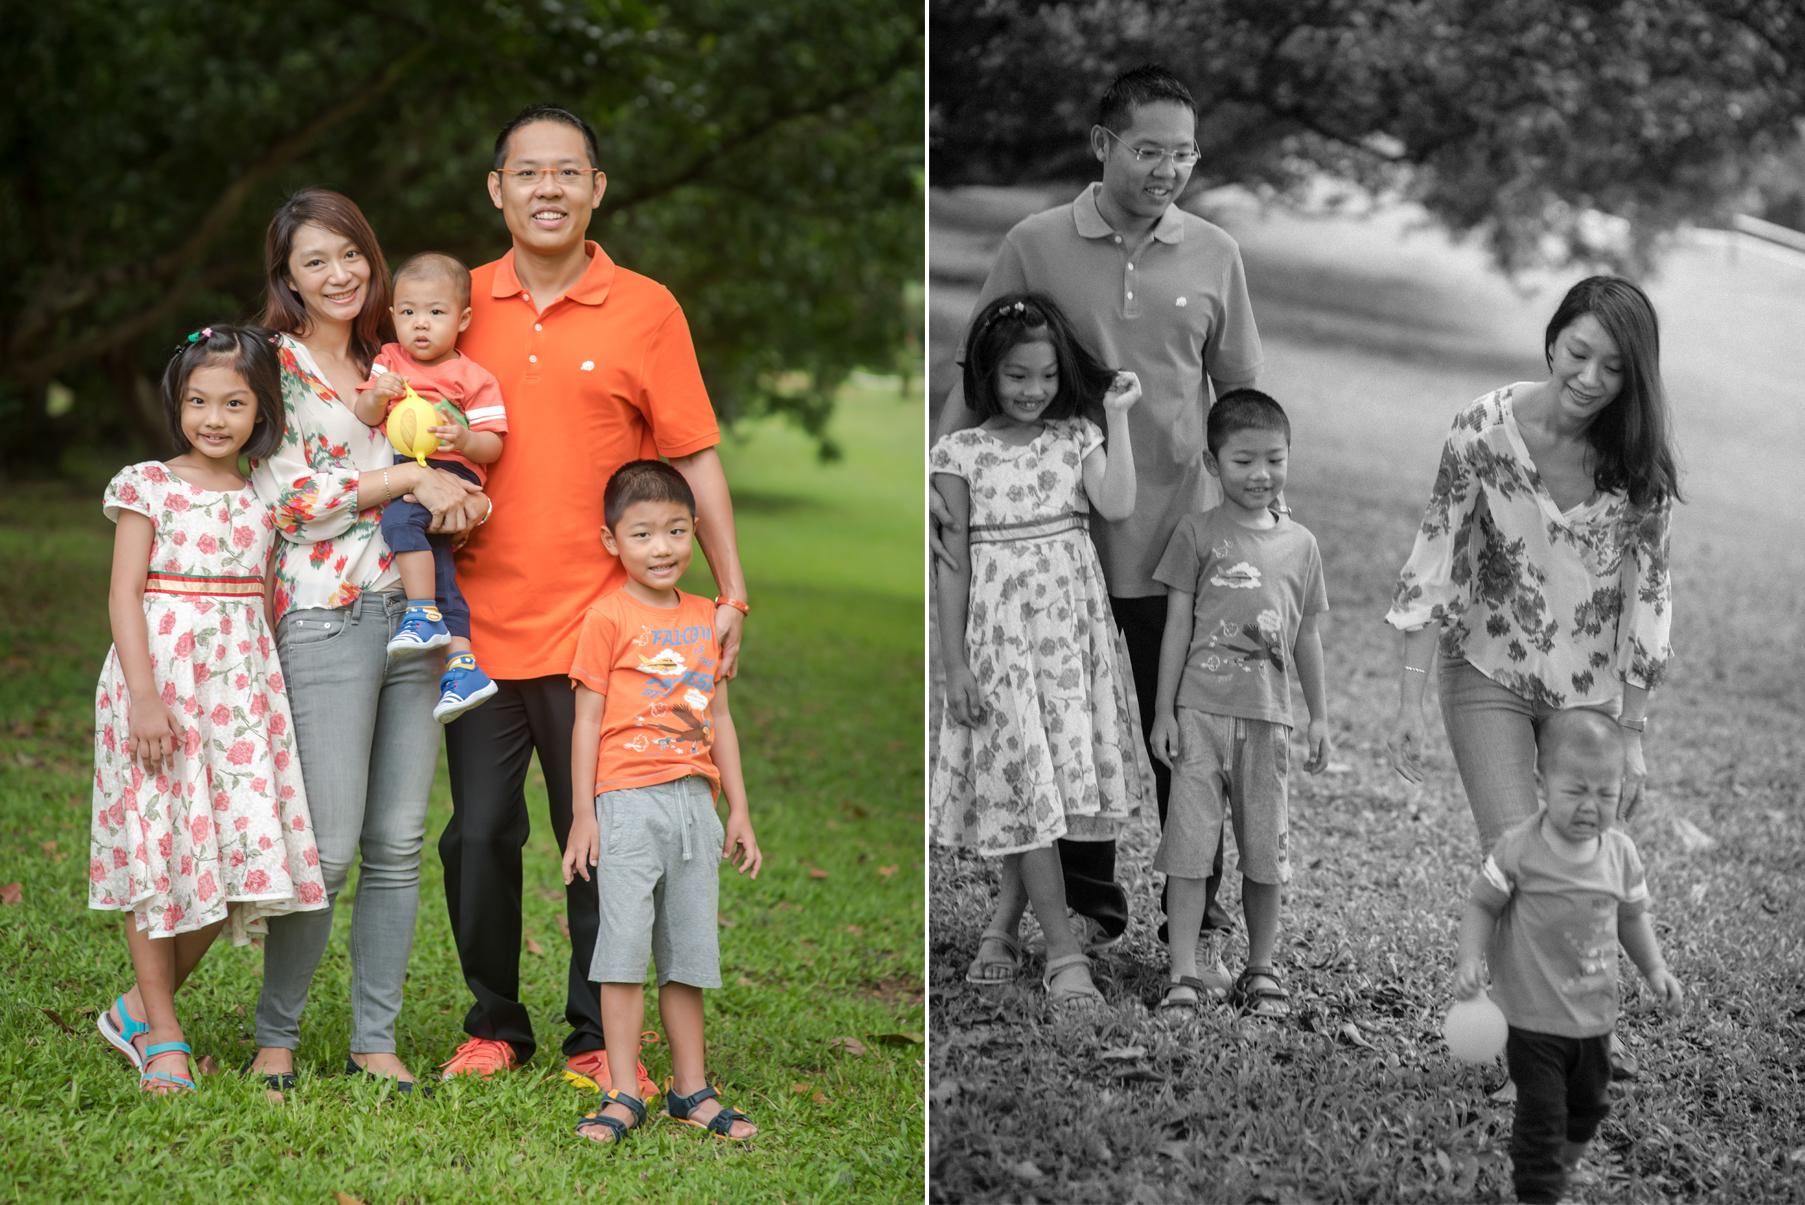 ang-mo-kio-park-family-02